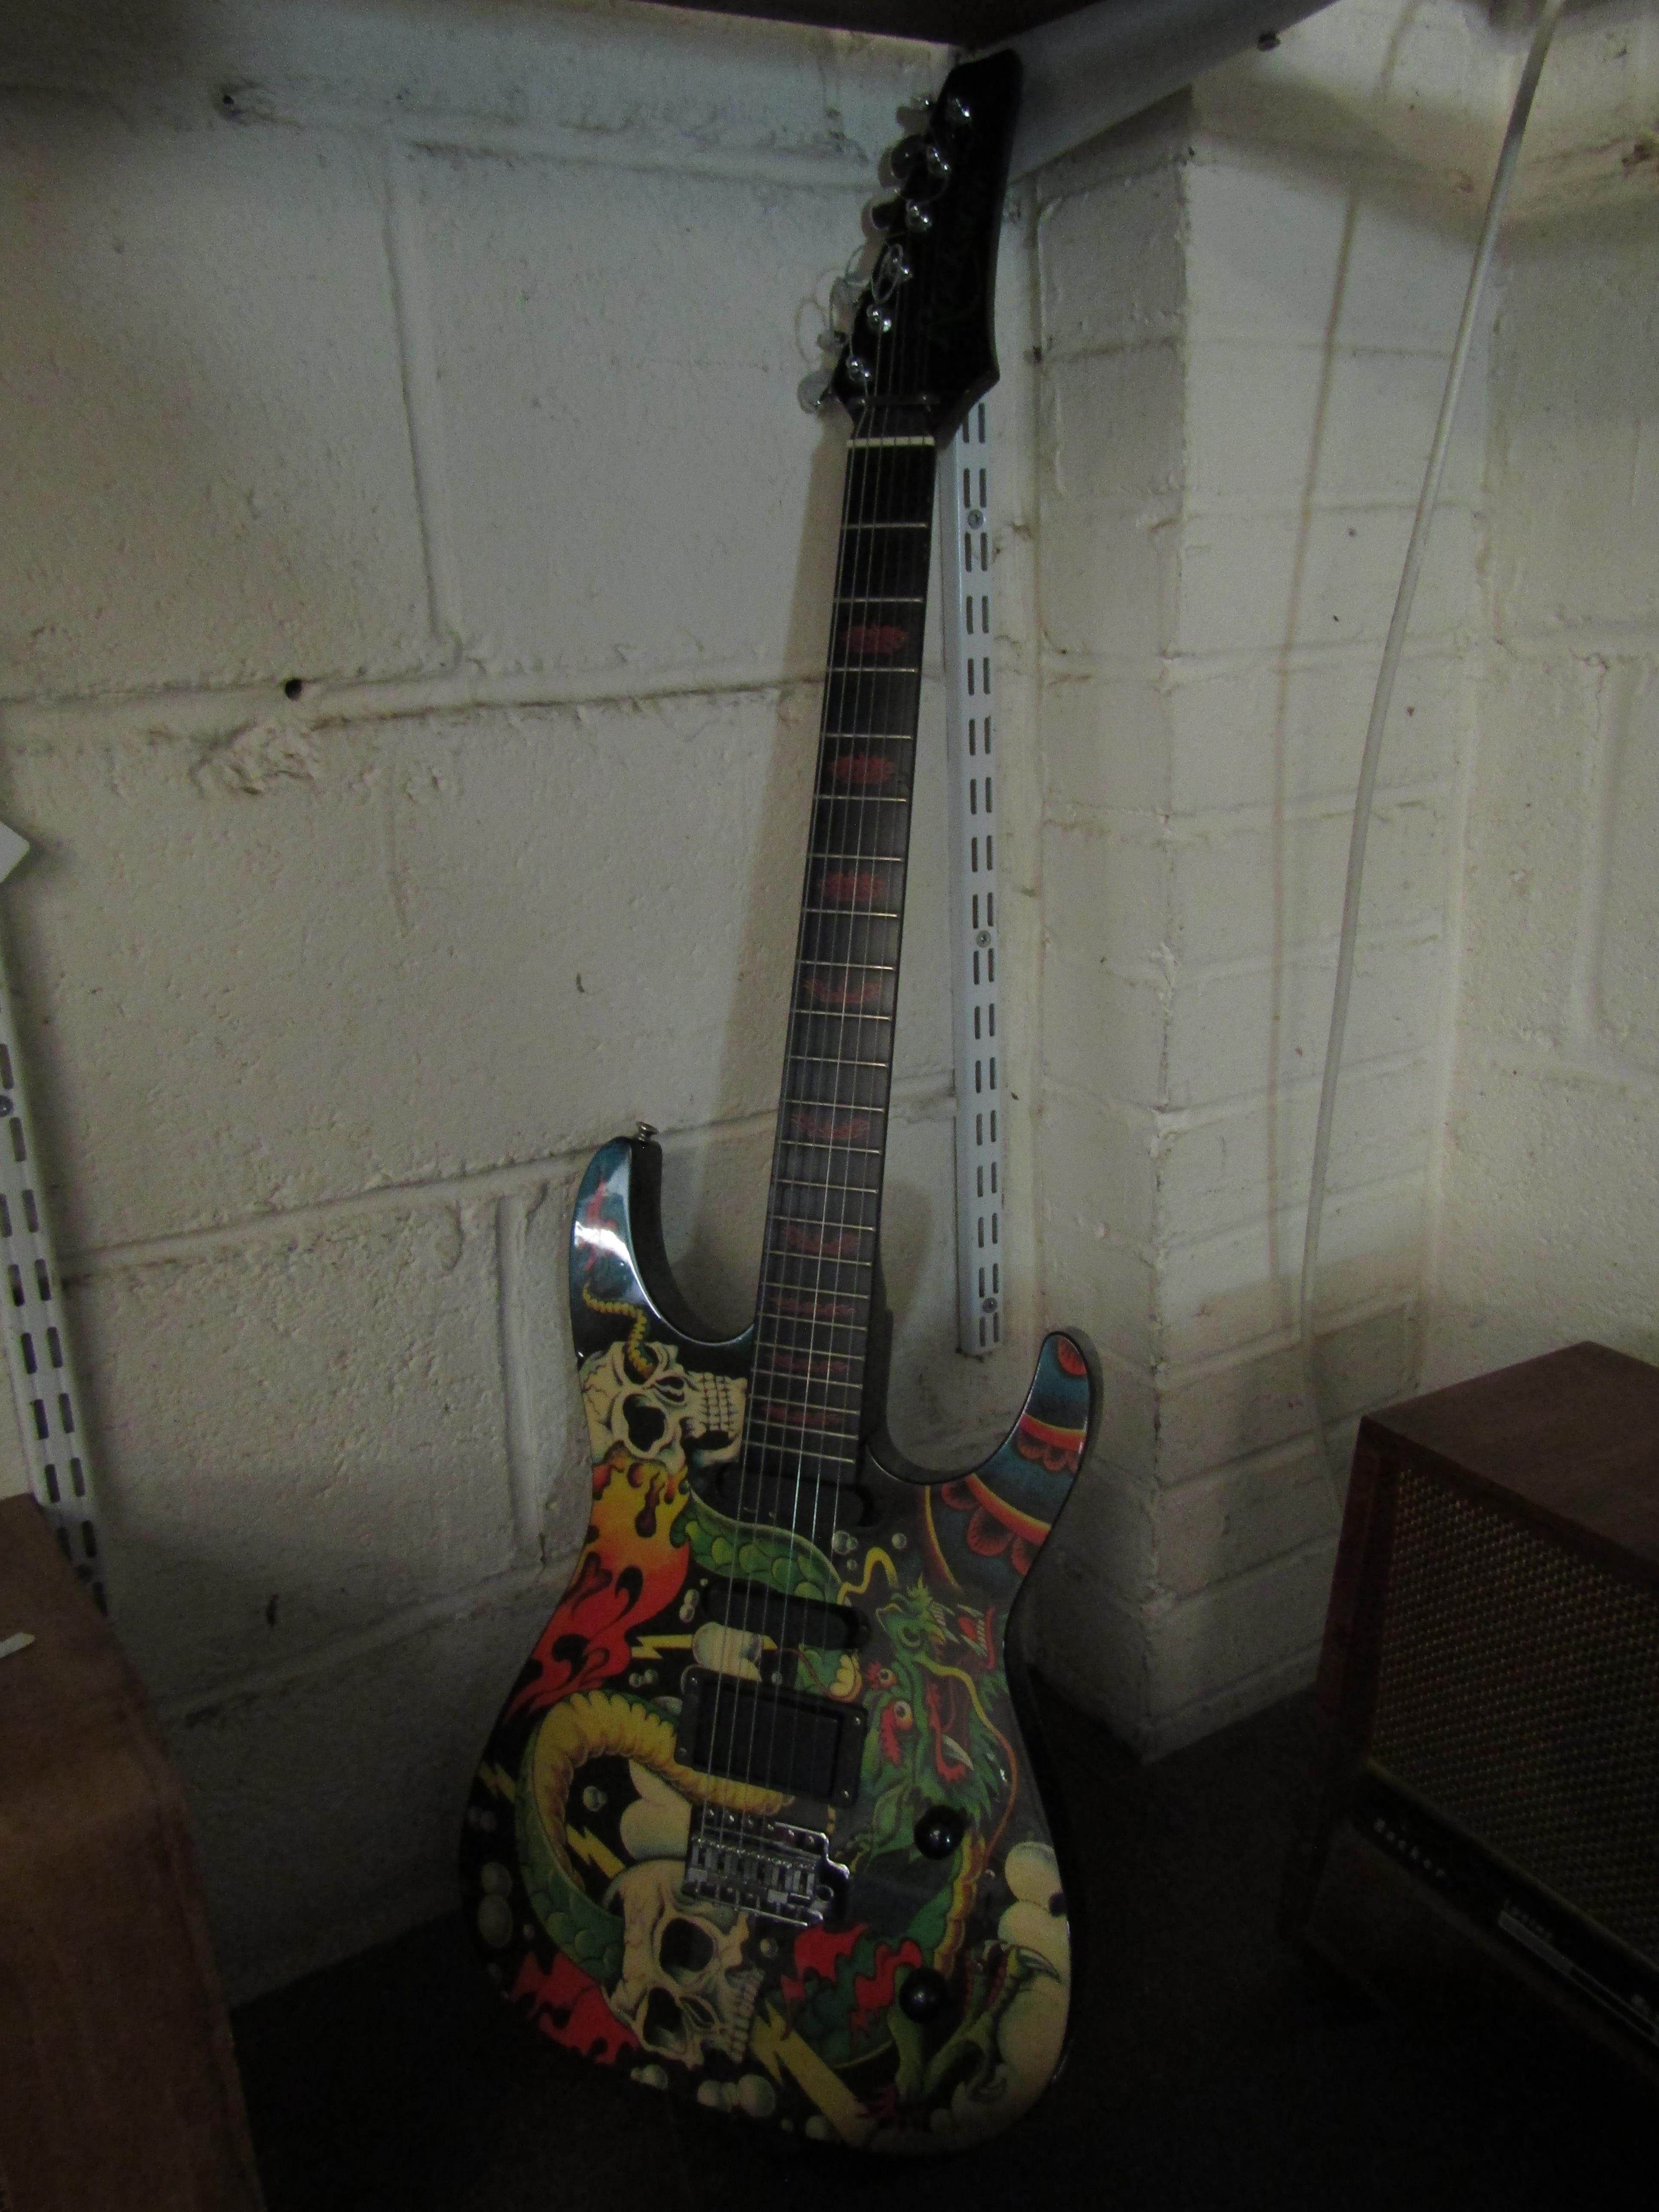 ROCKSTER ELECTRIC GUITAR